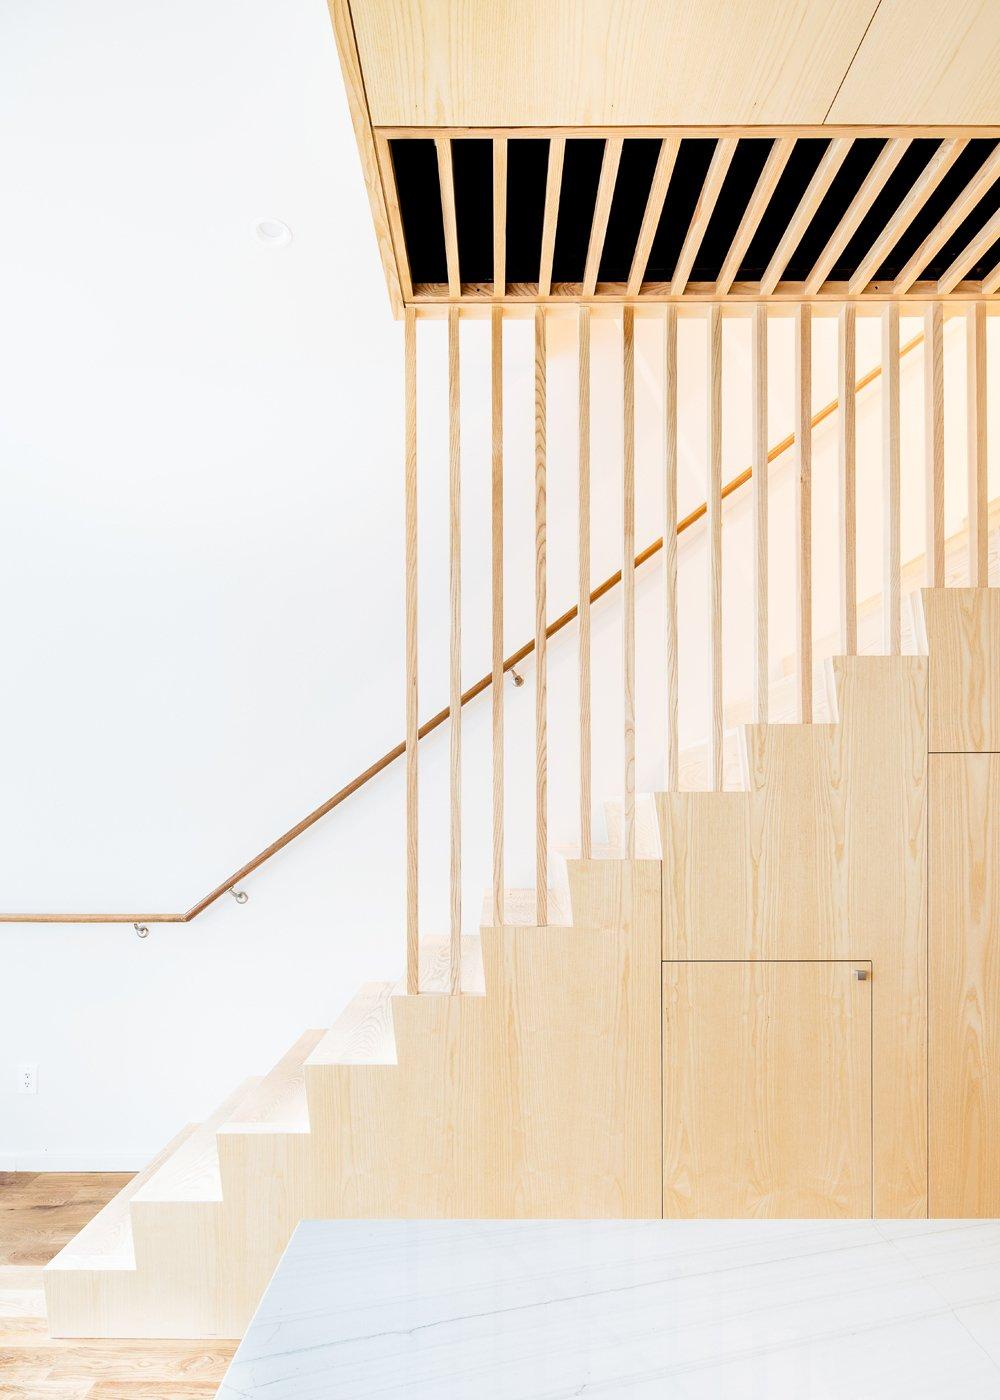 Staircase, Wood Tread, and Wood Railing  Wayne Street Row House by Jeff Jordan Architects